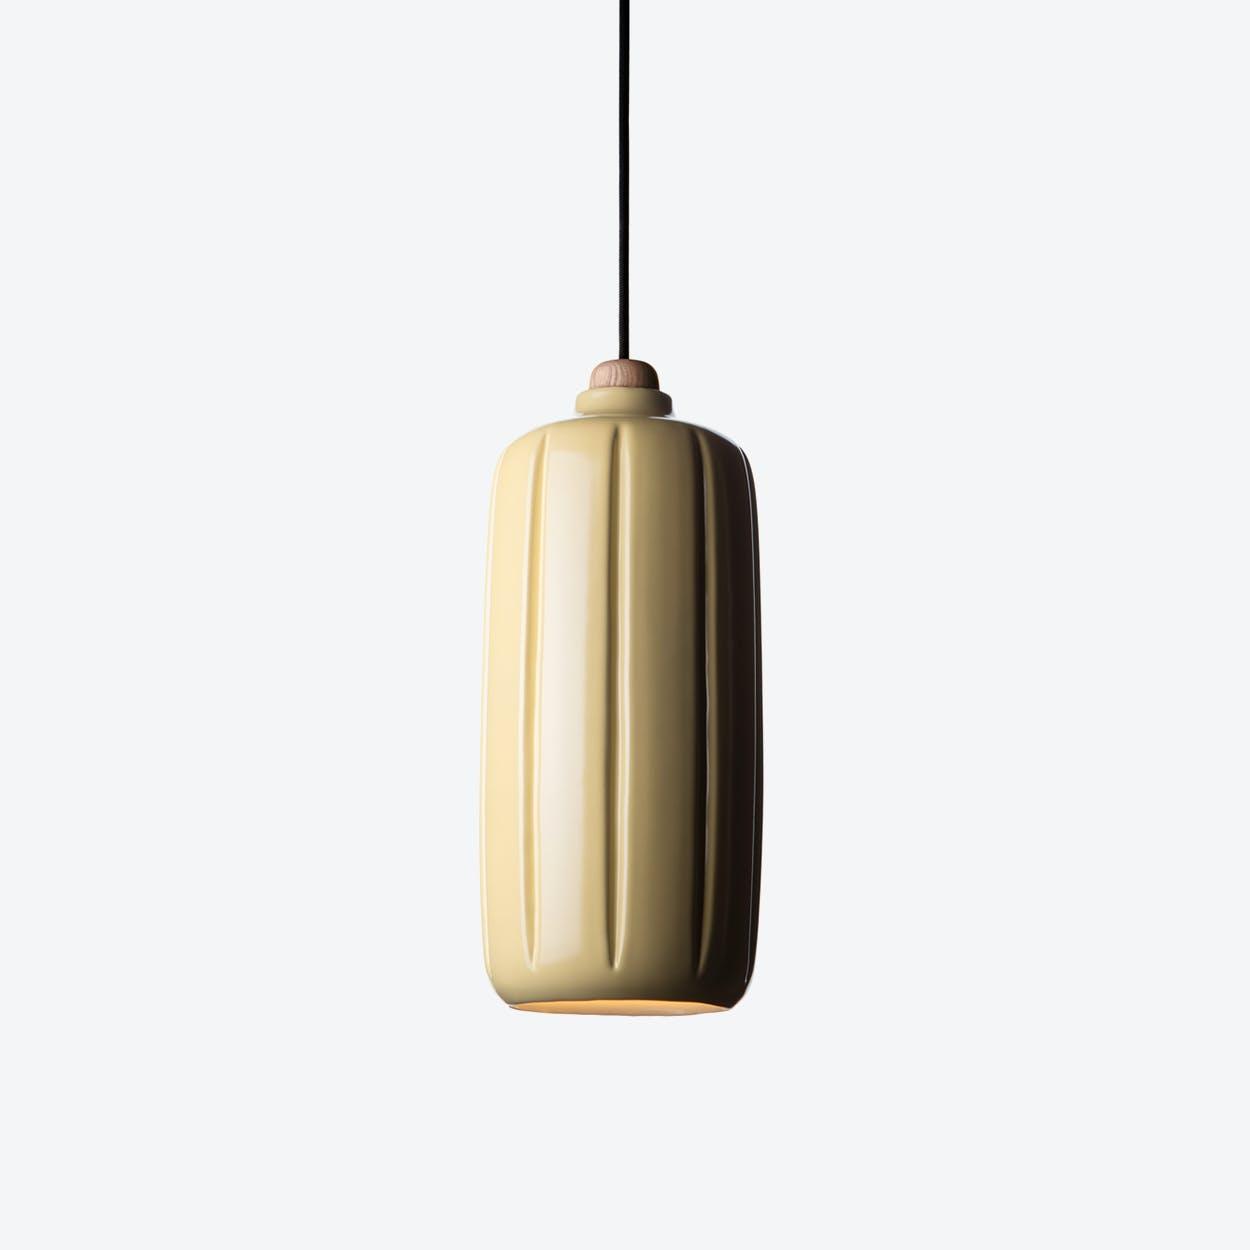 Cosse Large Pendant Lamp in Yellow